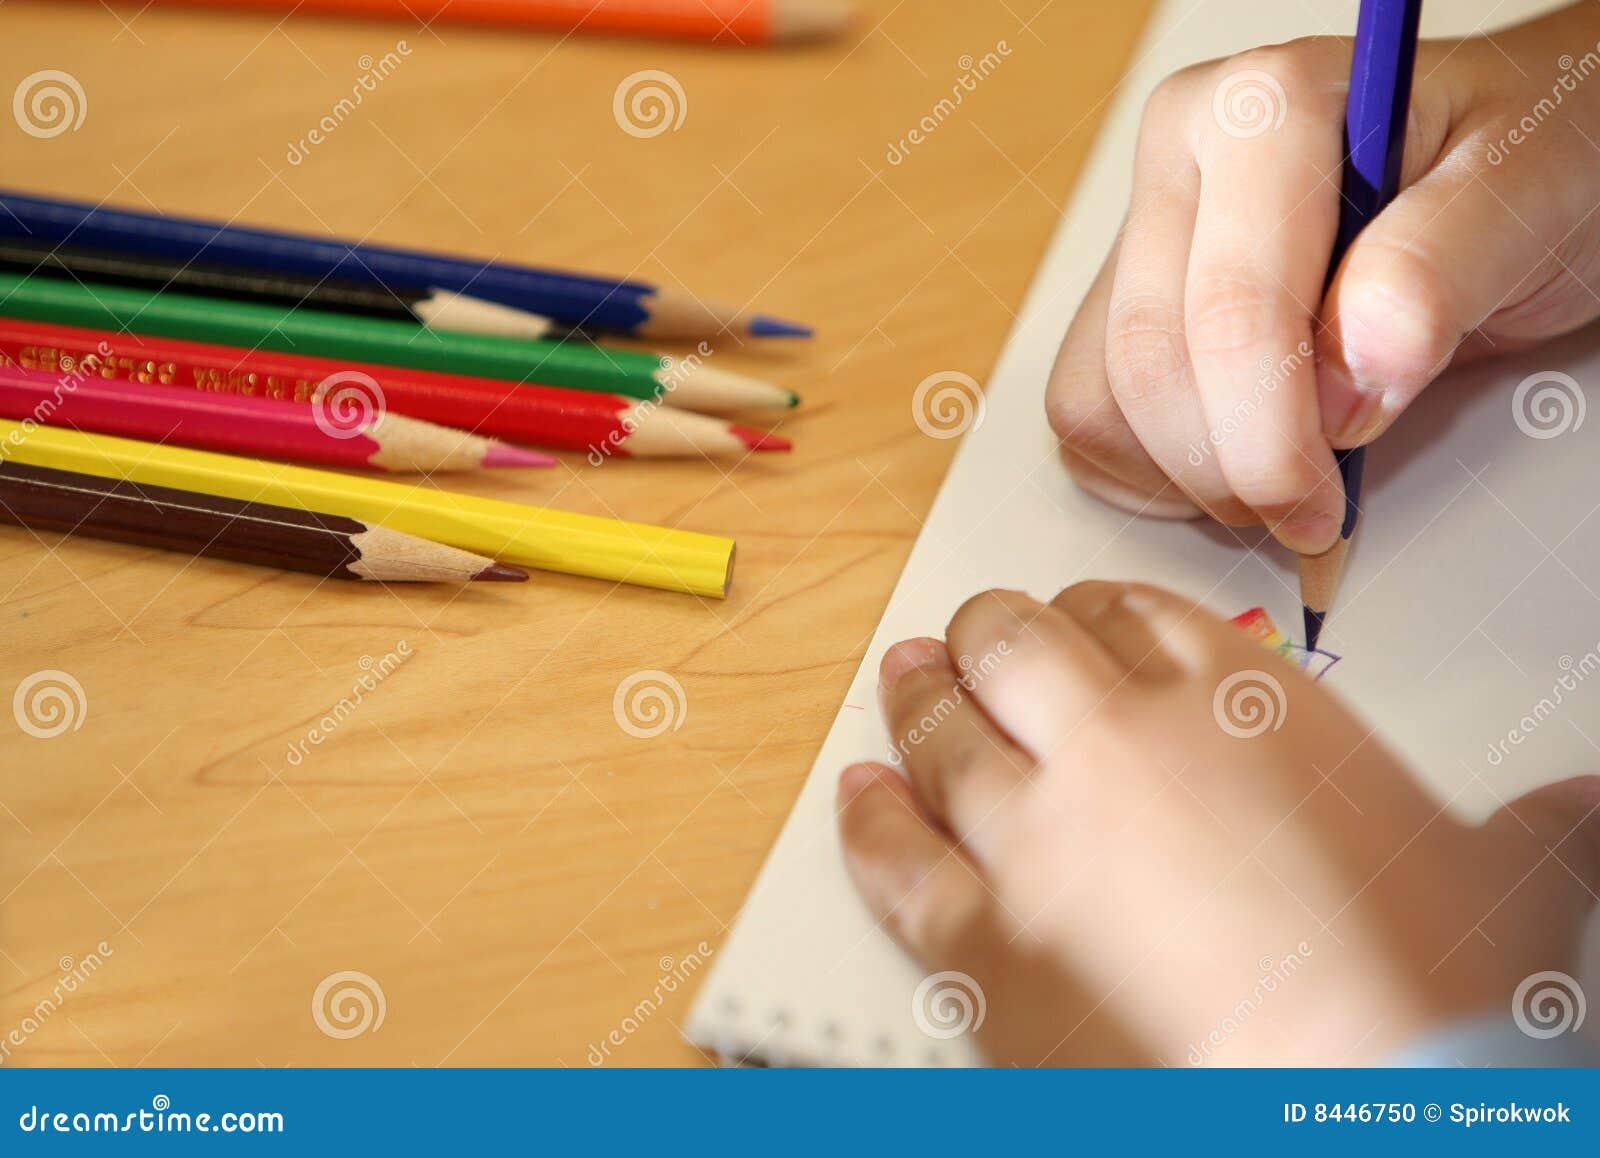 Child draw